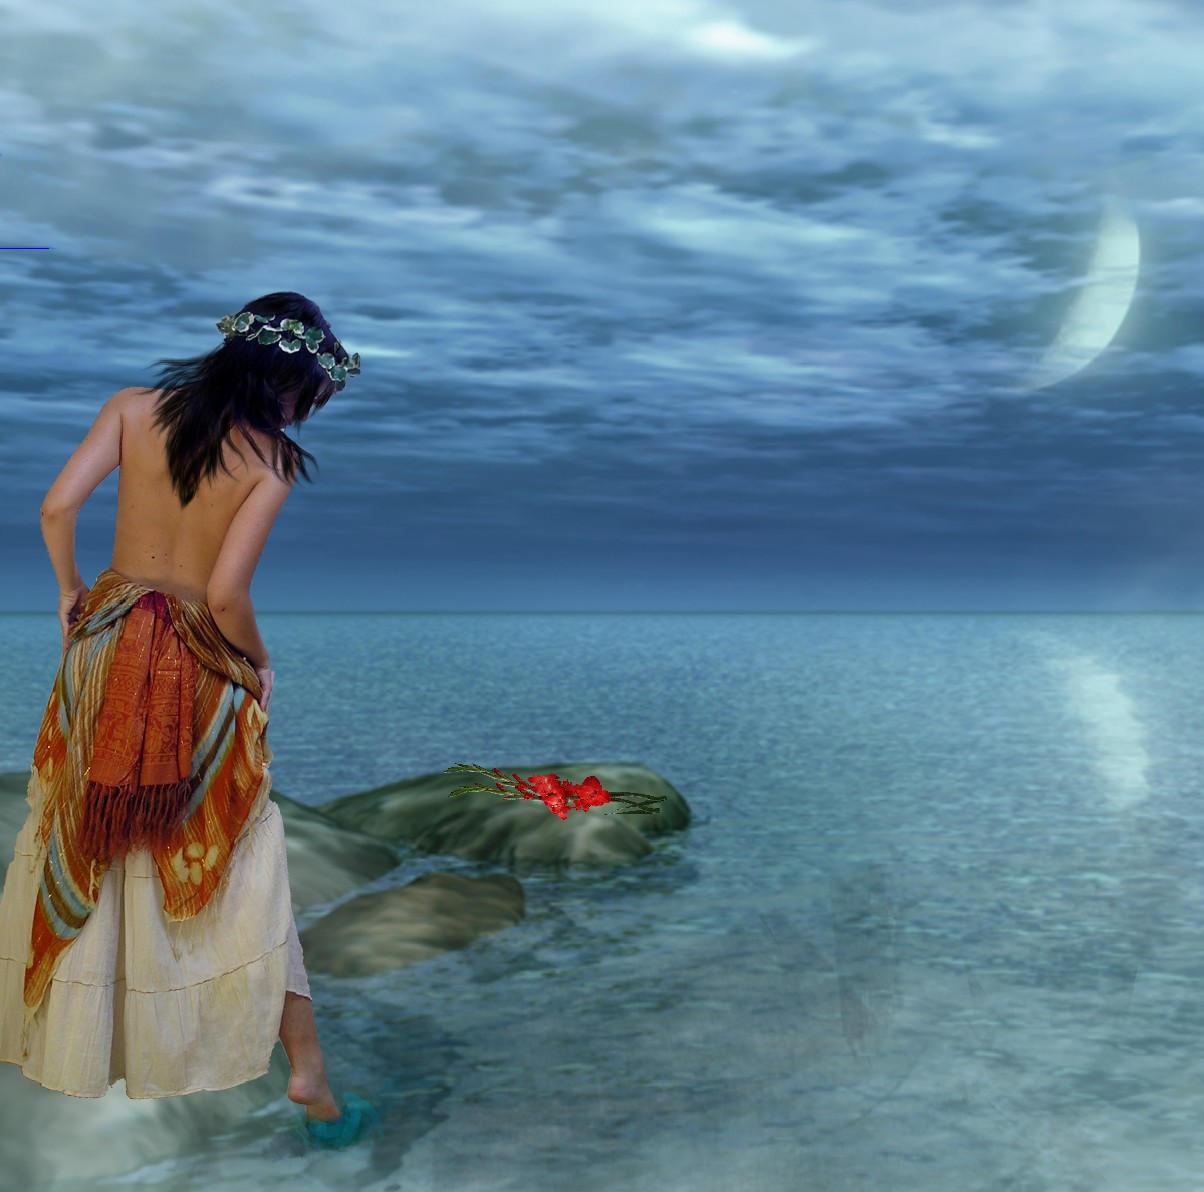 A Bath Under The Moon By Lil Desi Chik On Deviantart